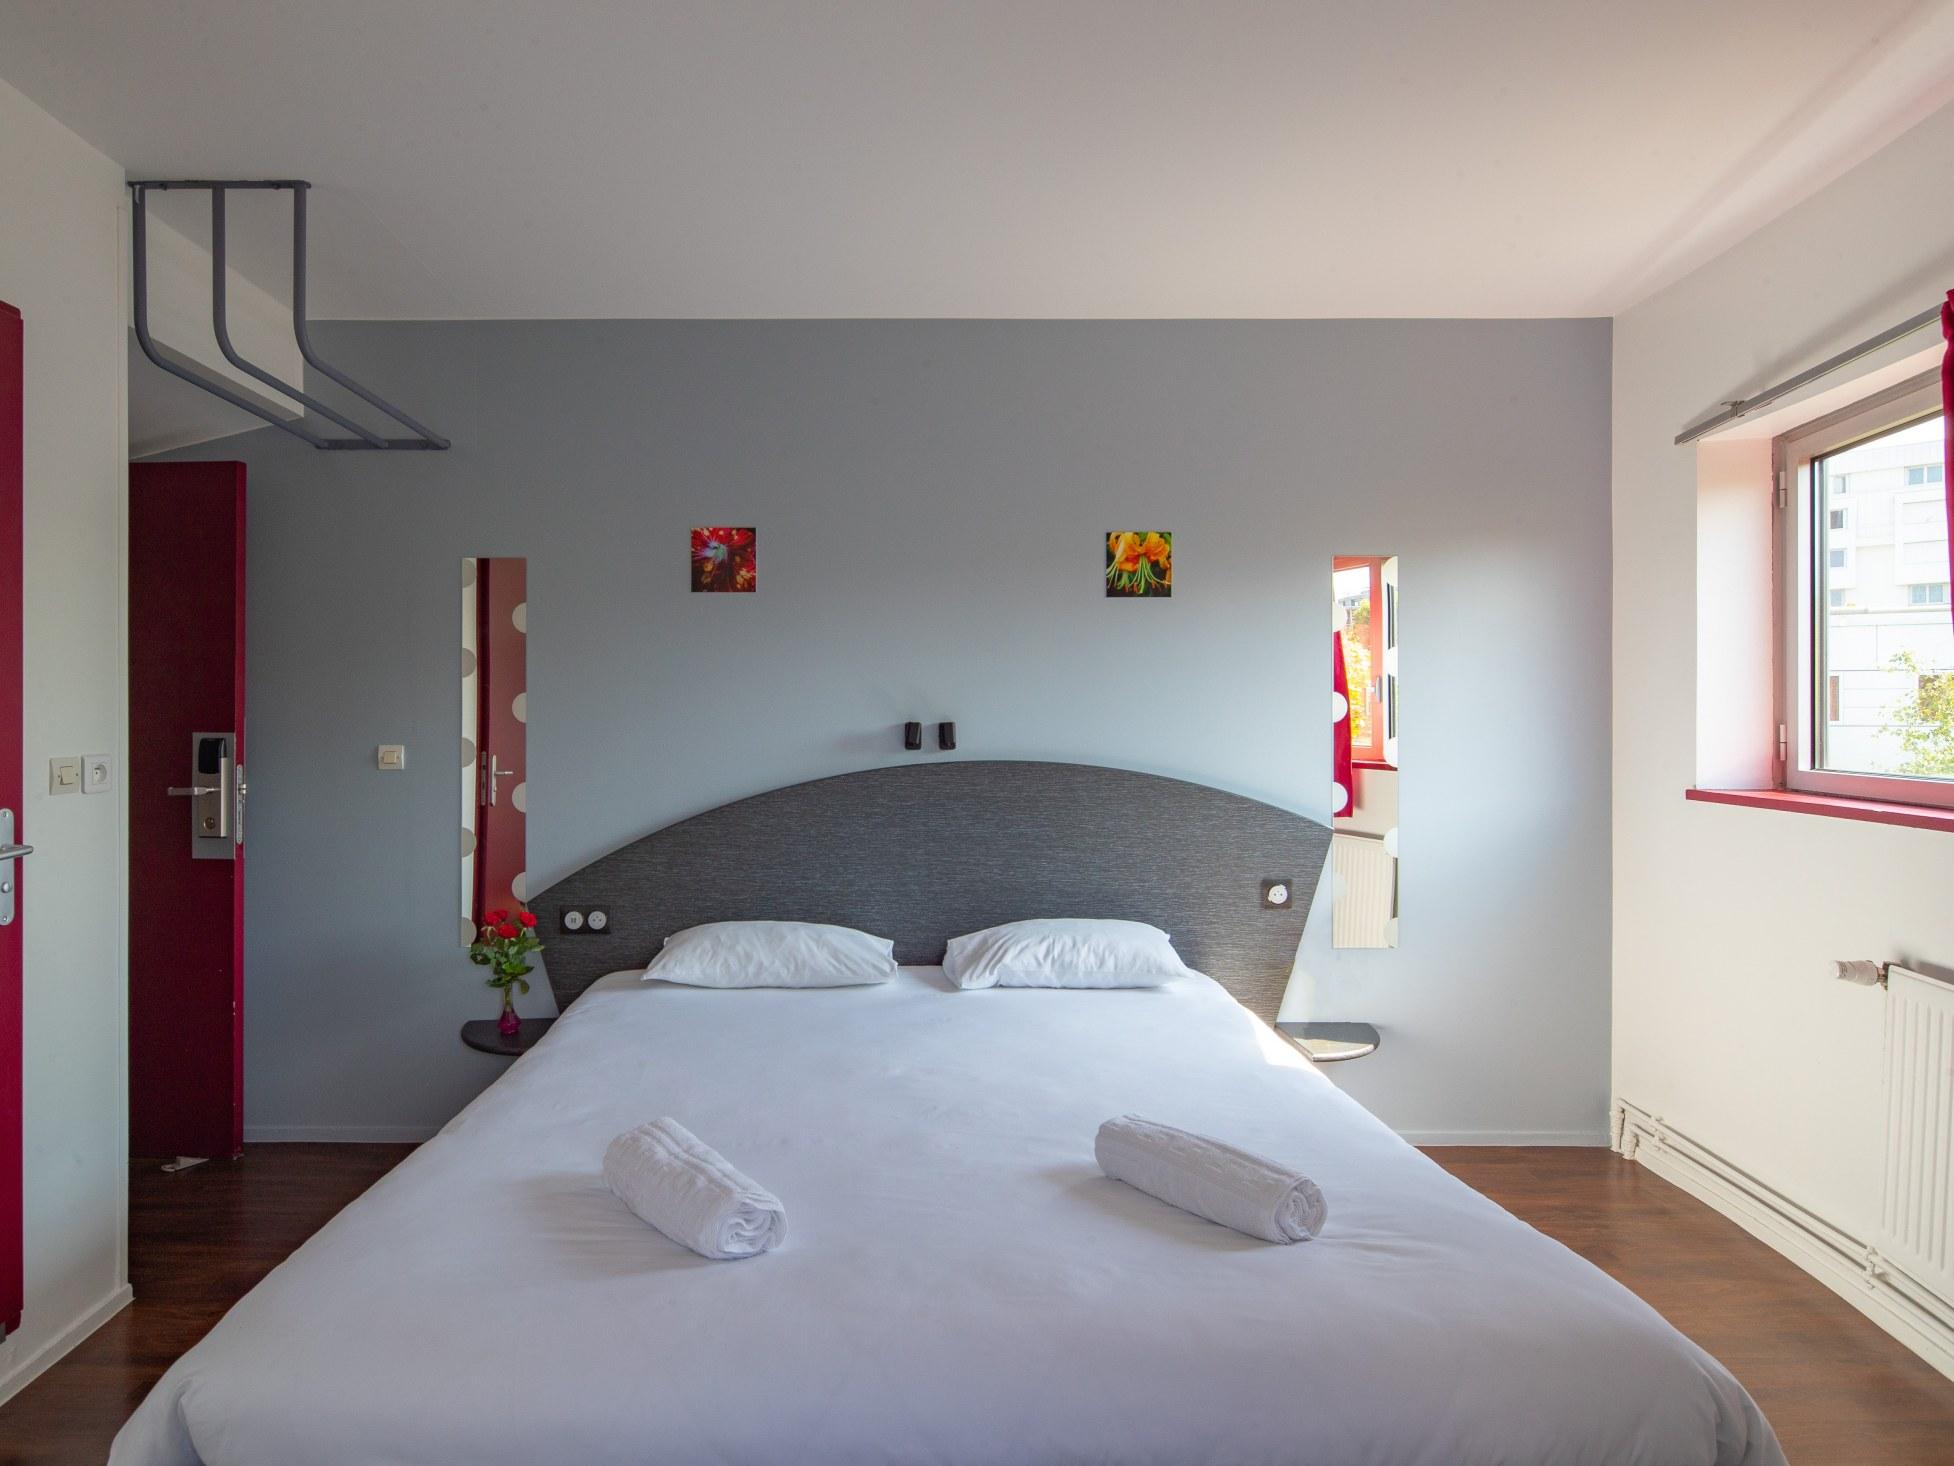 Superior Room with bathroom